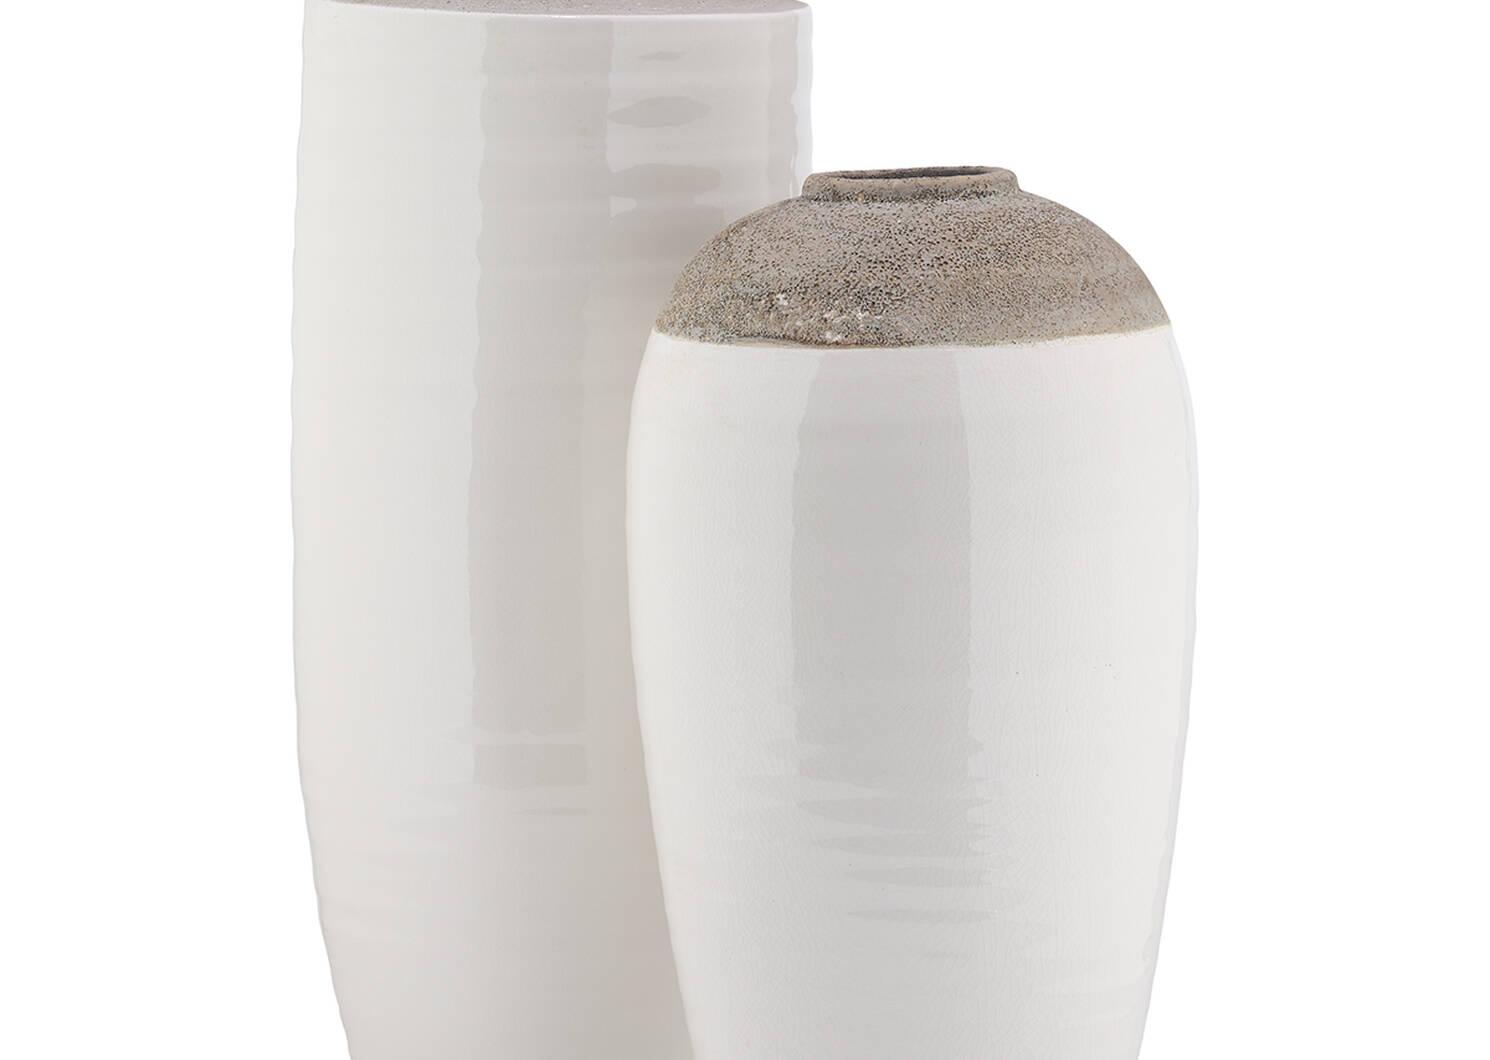 Petit vase Janis blanc